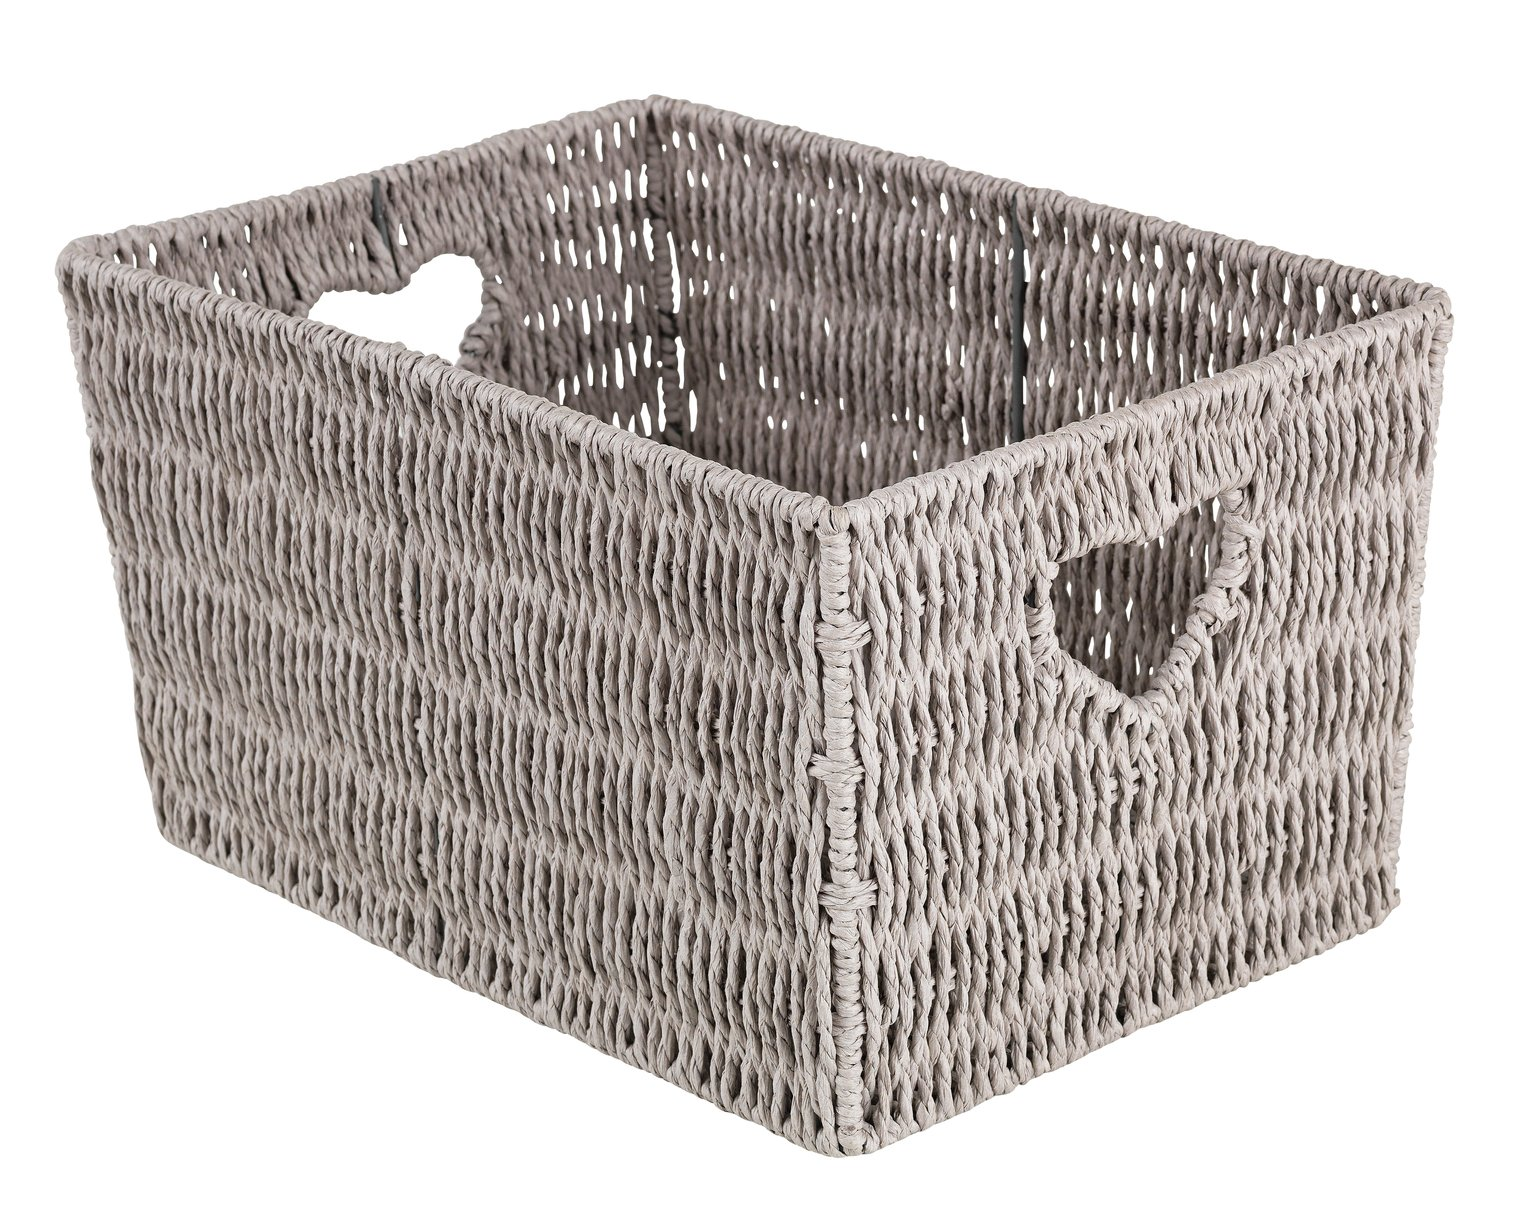 Argos Home Large Woven Heart Storage Basket